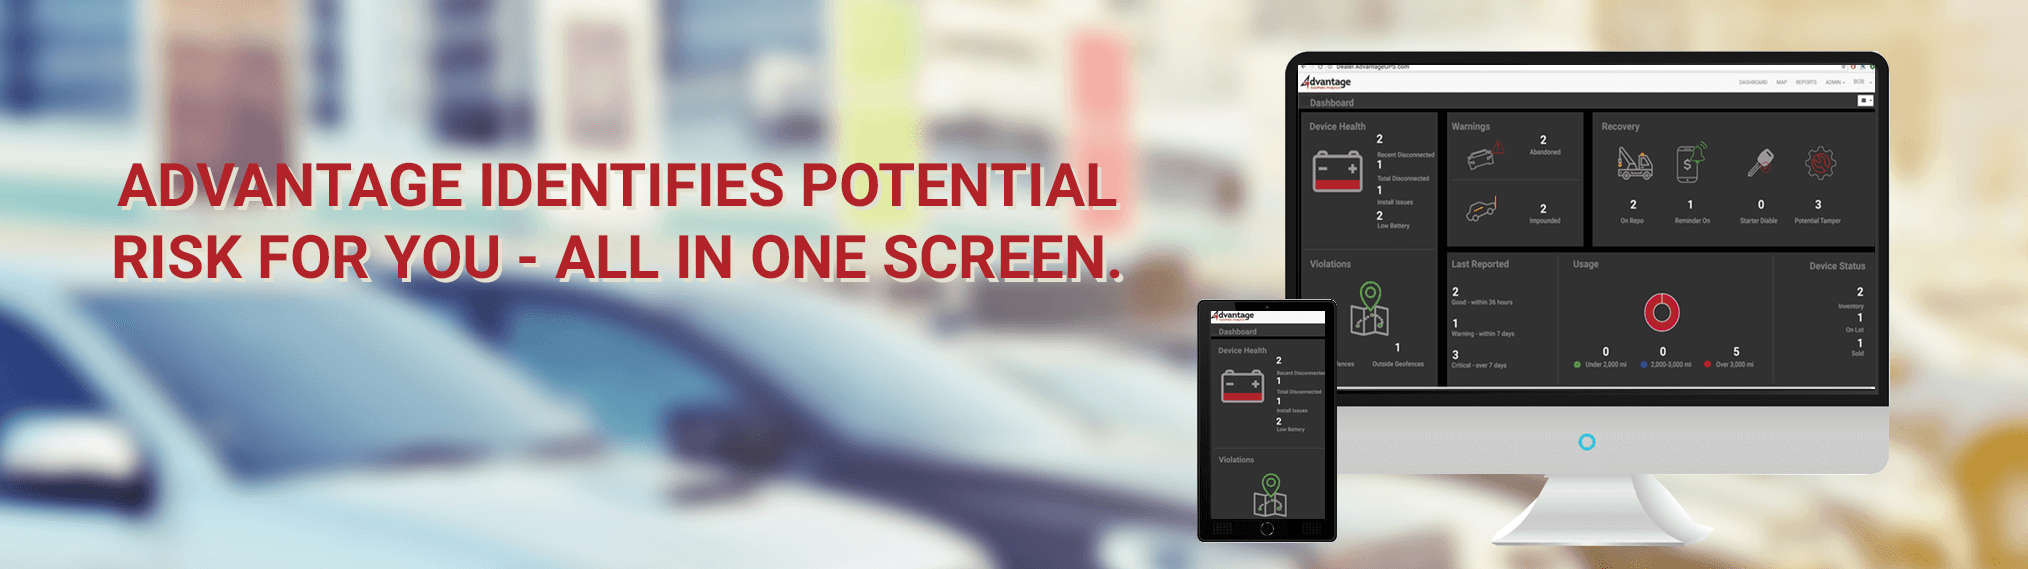 Identify Risks - Dashboard - Advantage GPS